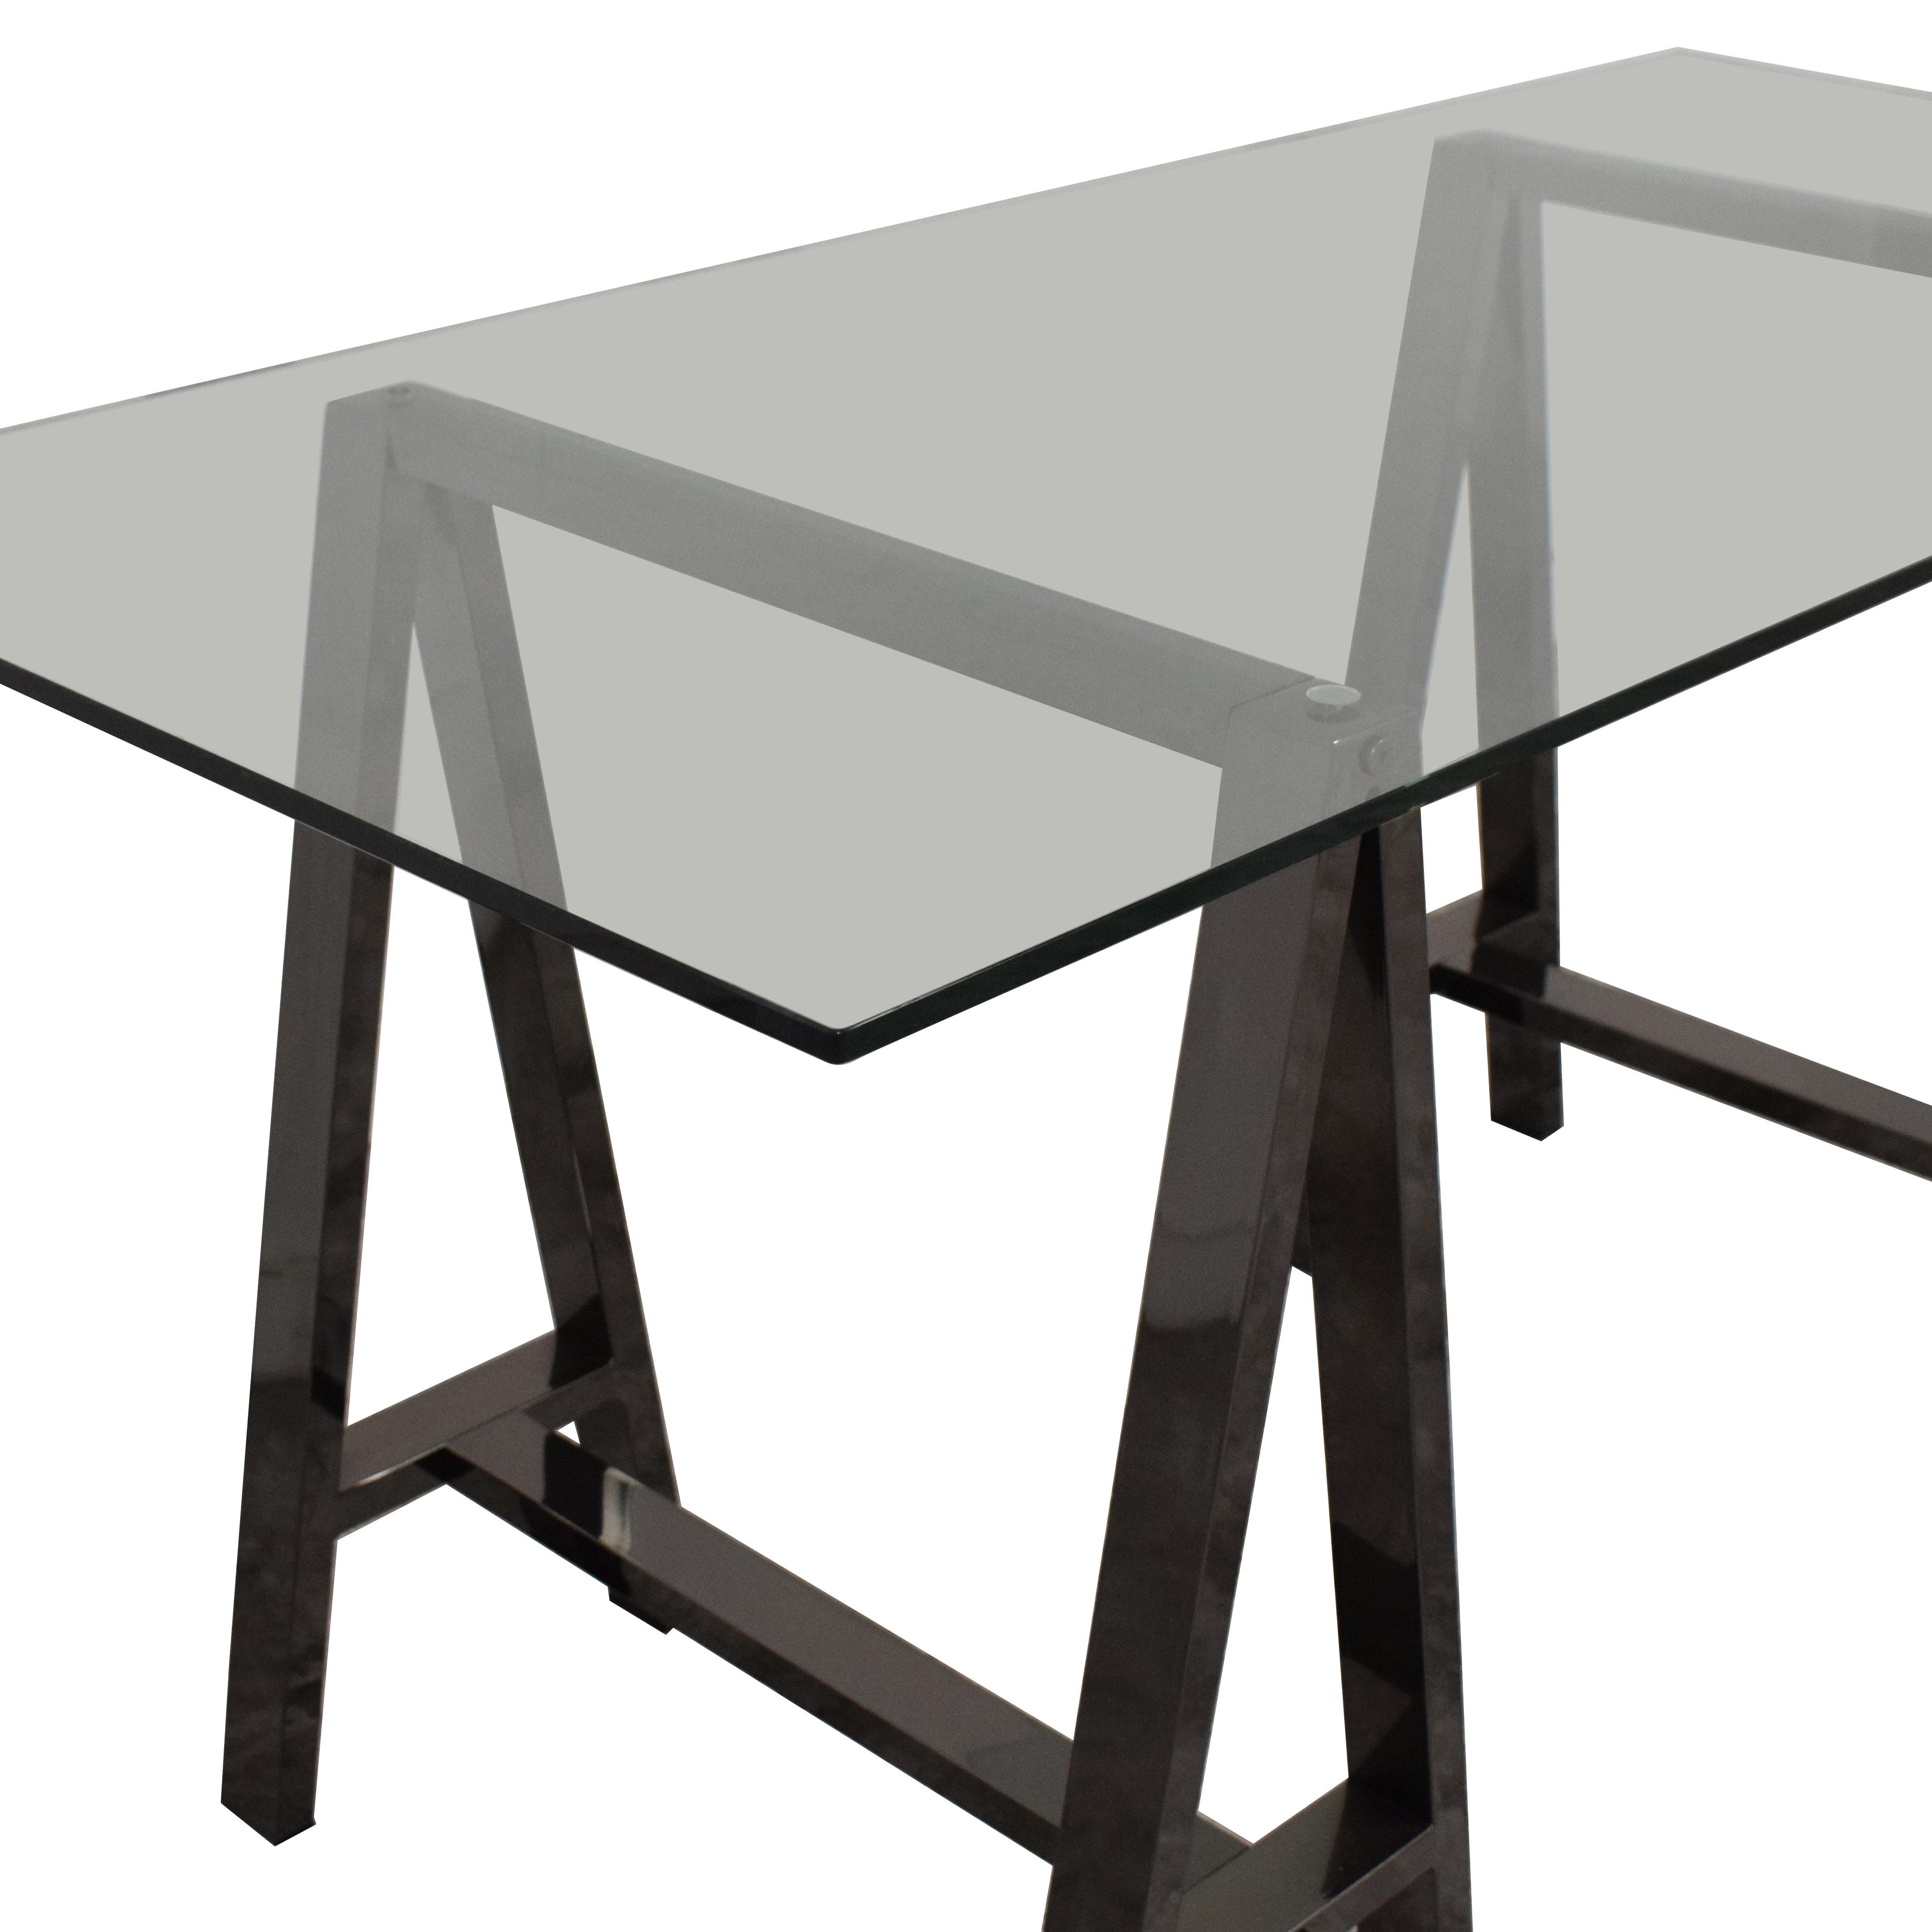 West Elm West Elm Cross-Base Desk Tables